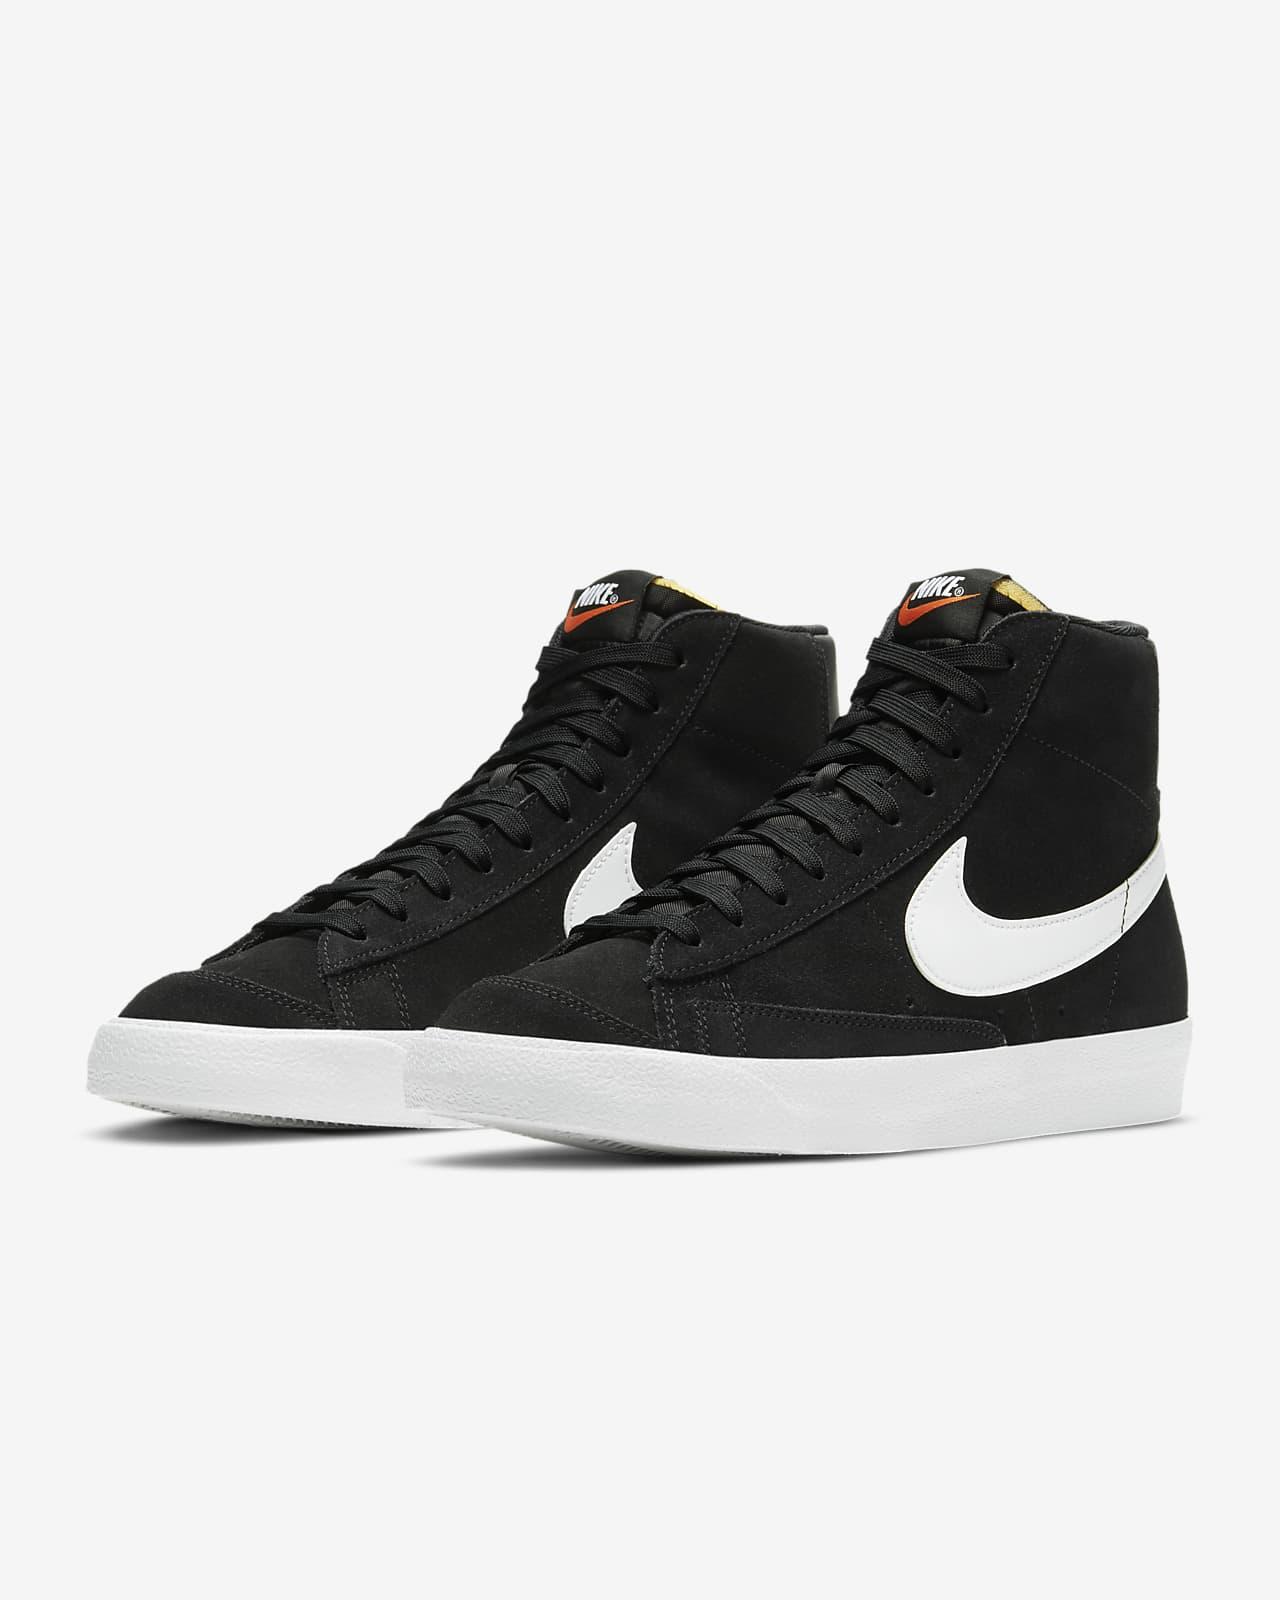 Chaussure Nike Blazer Mid '77 Suede. Nike LU